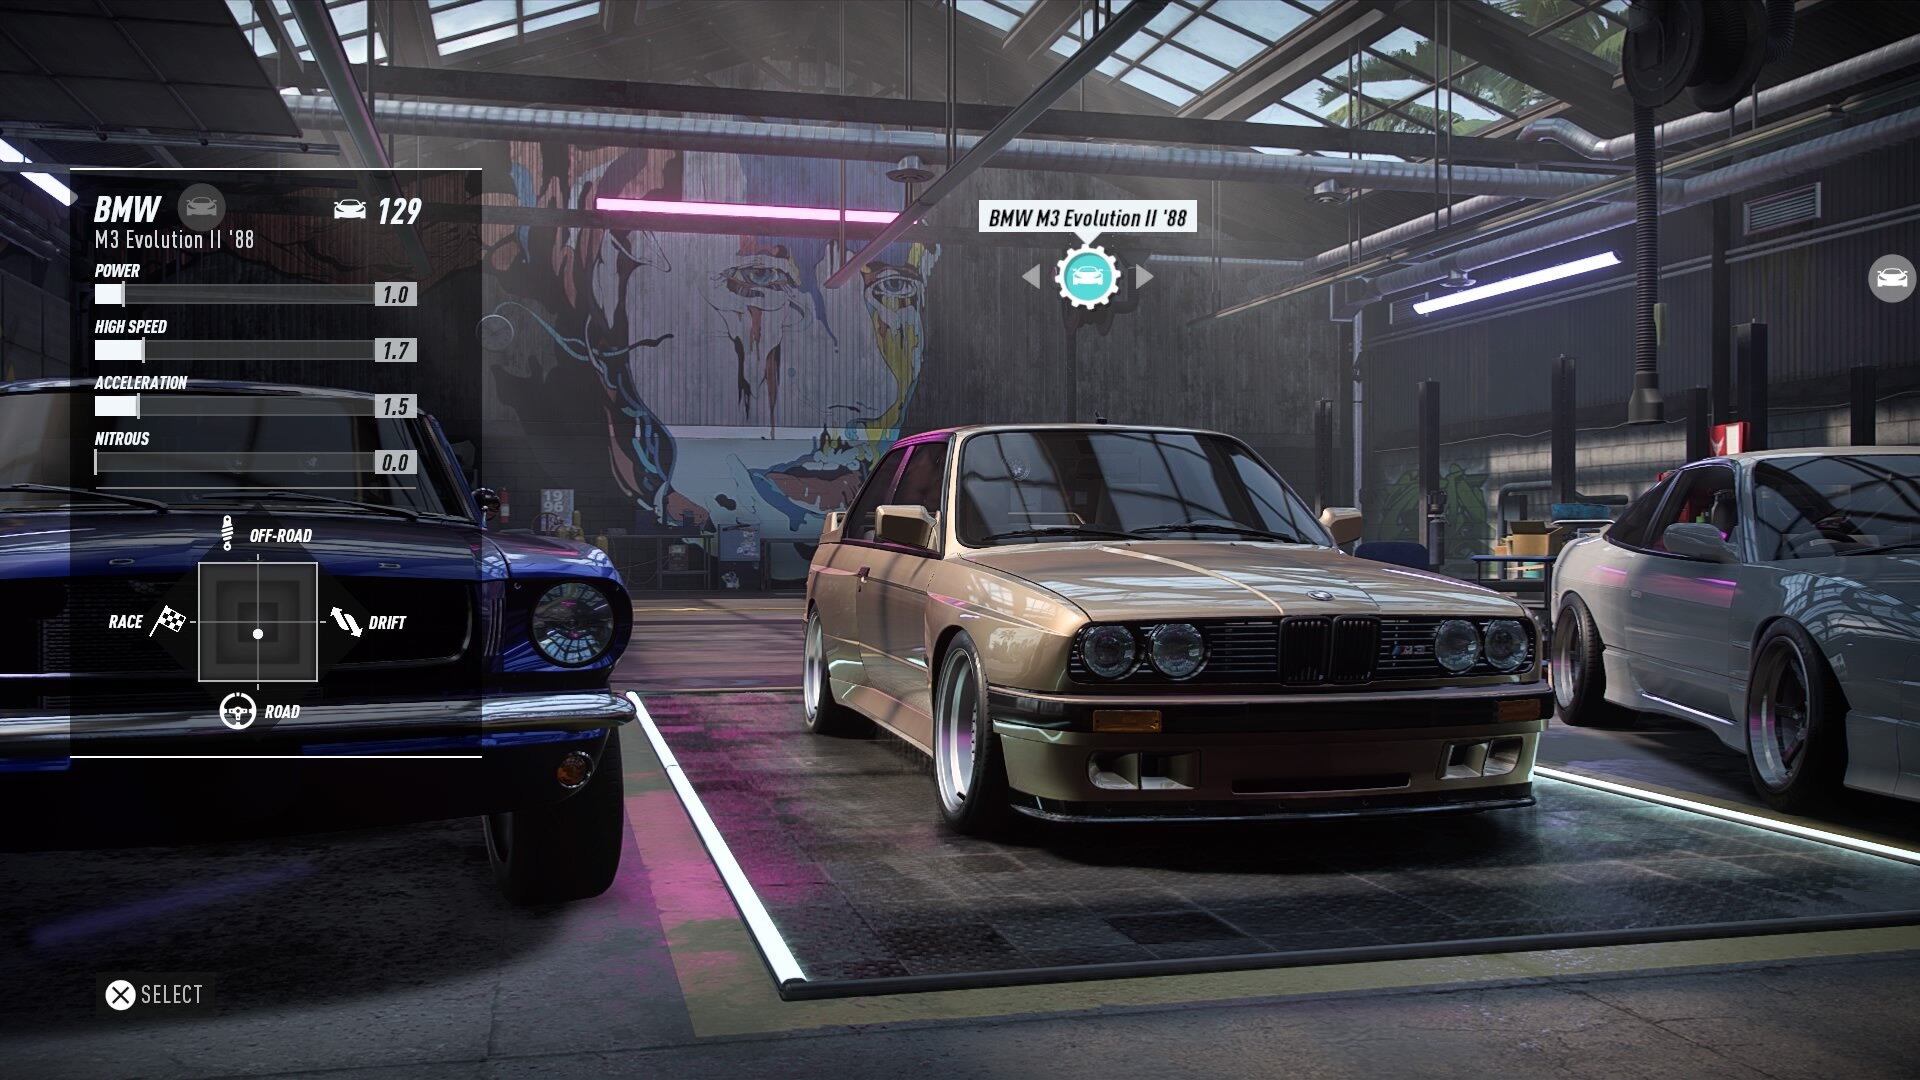 Playstation 4 In-Game Screenshot